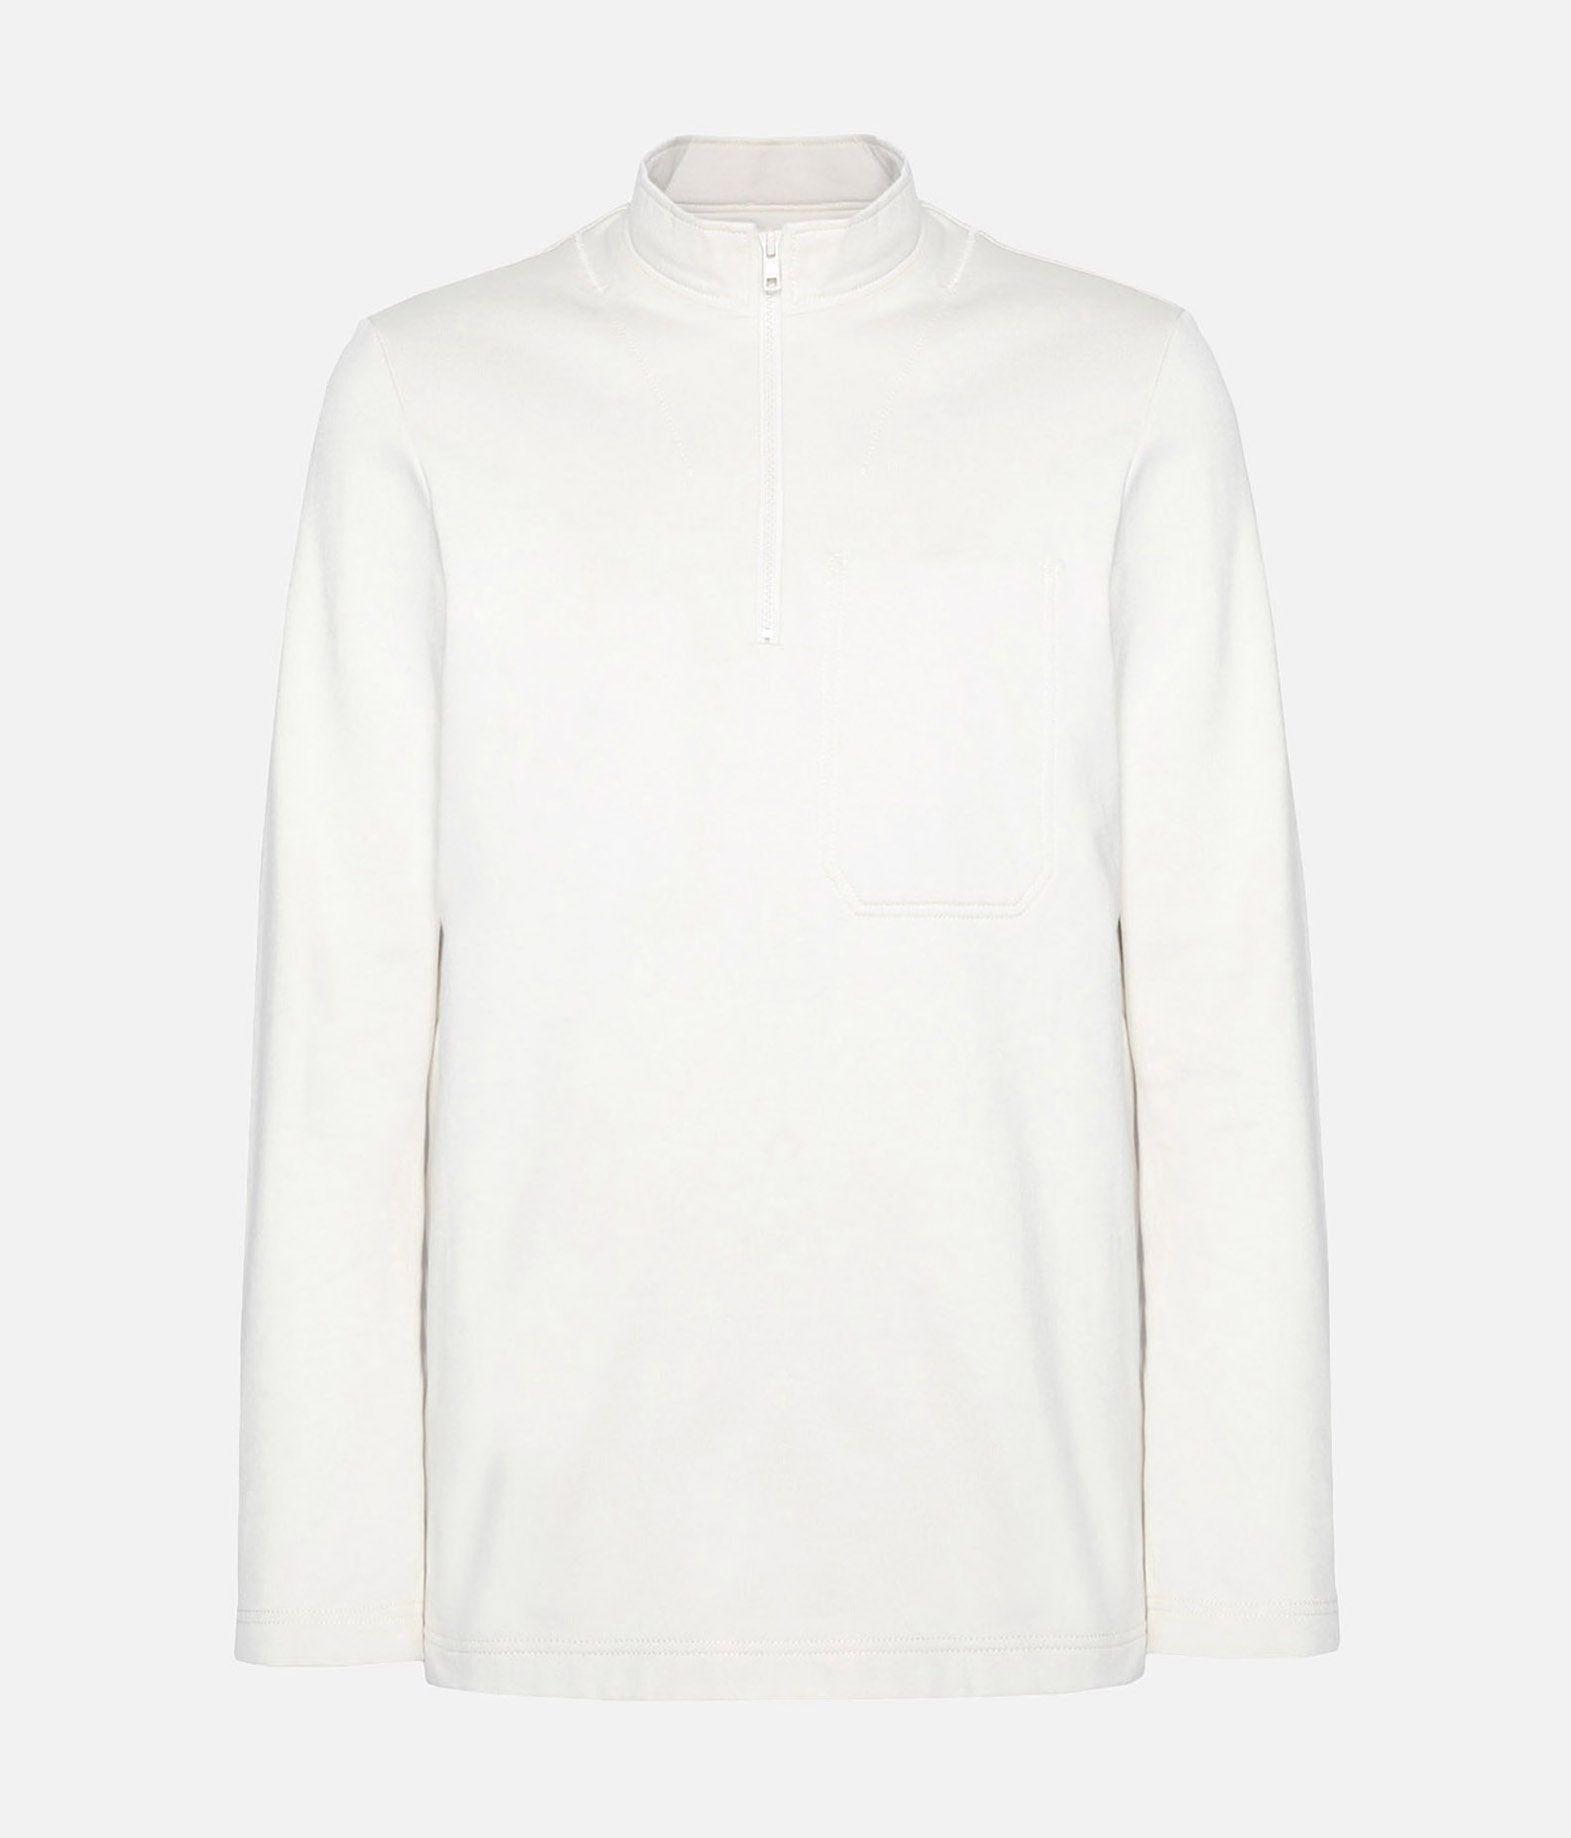 Y-3 Y-3 Sashiko Sweater Толстовка на молнии Для Мужчин f